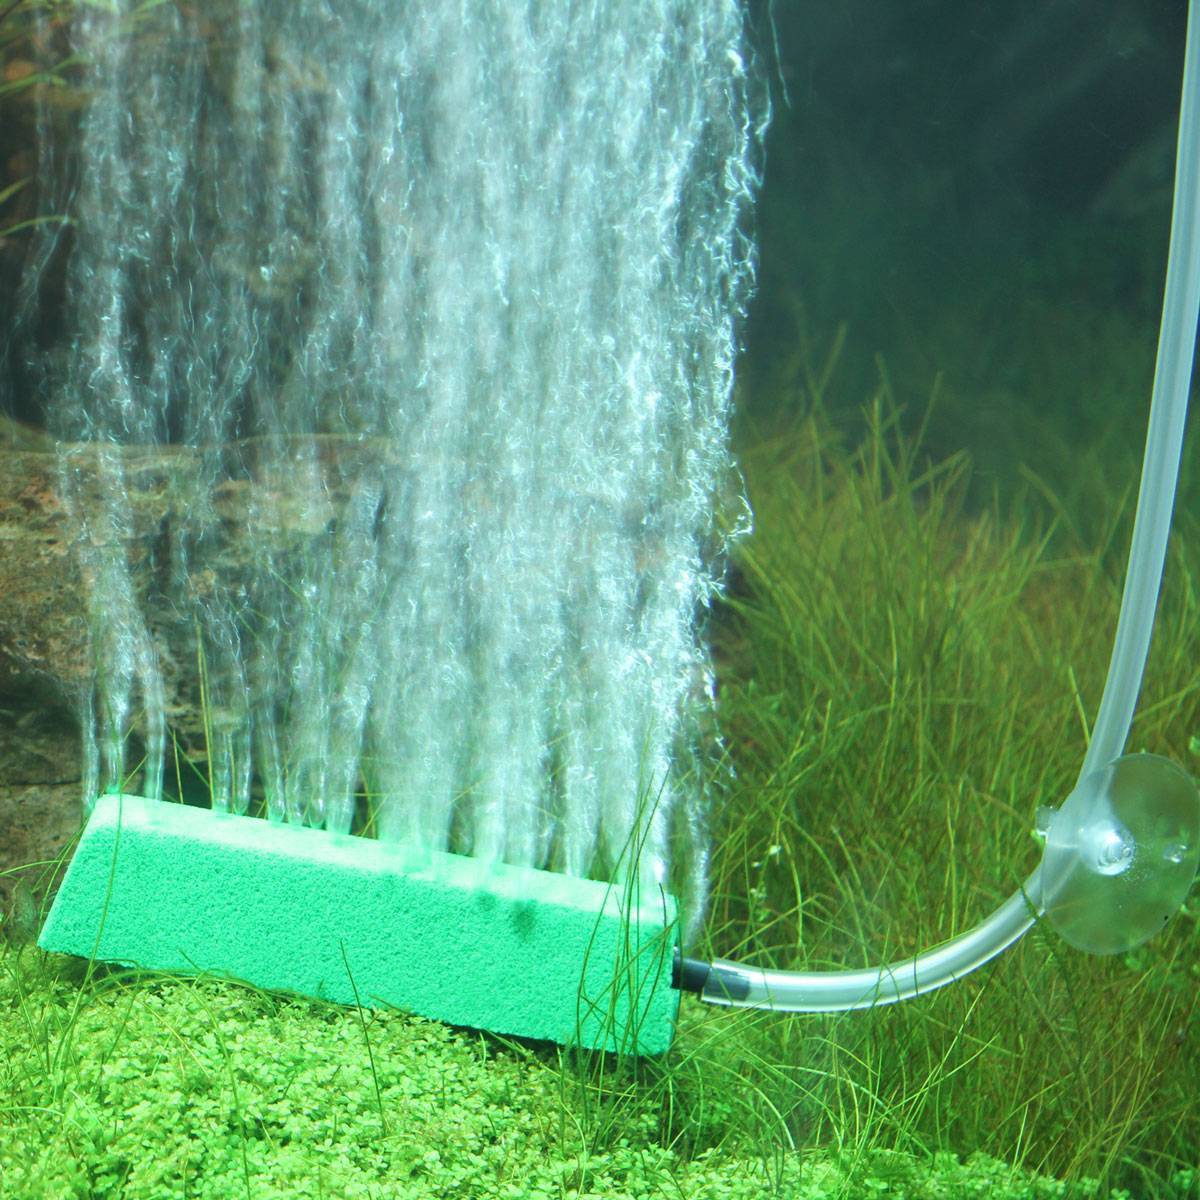 Аэрация аквариума: нужна ли в аквариуме, способы подачи